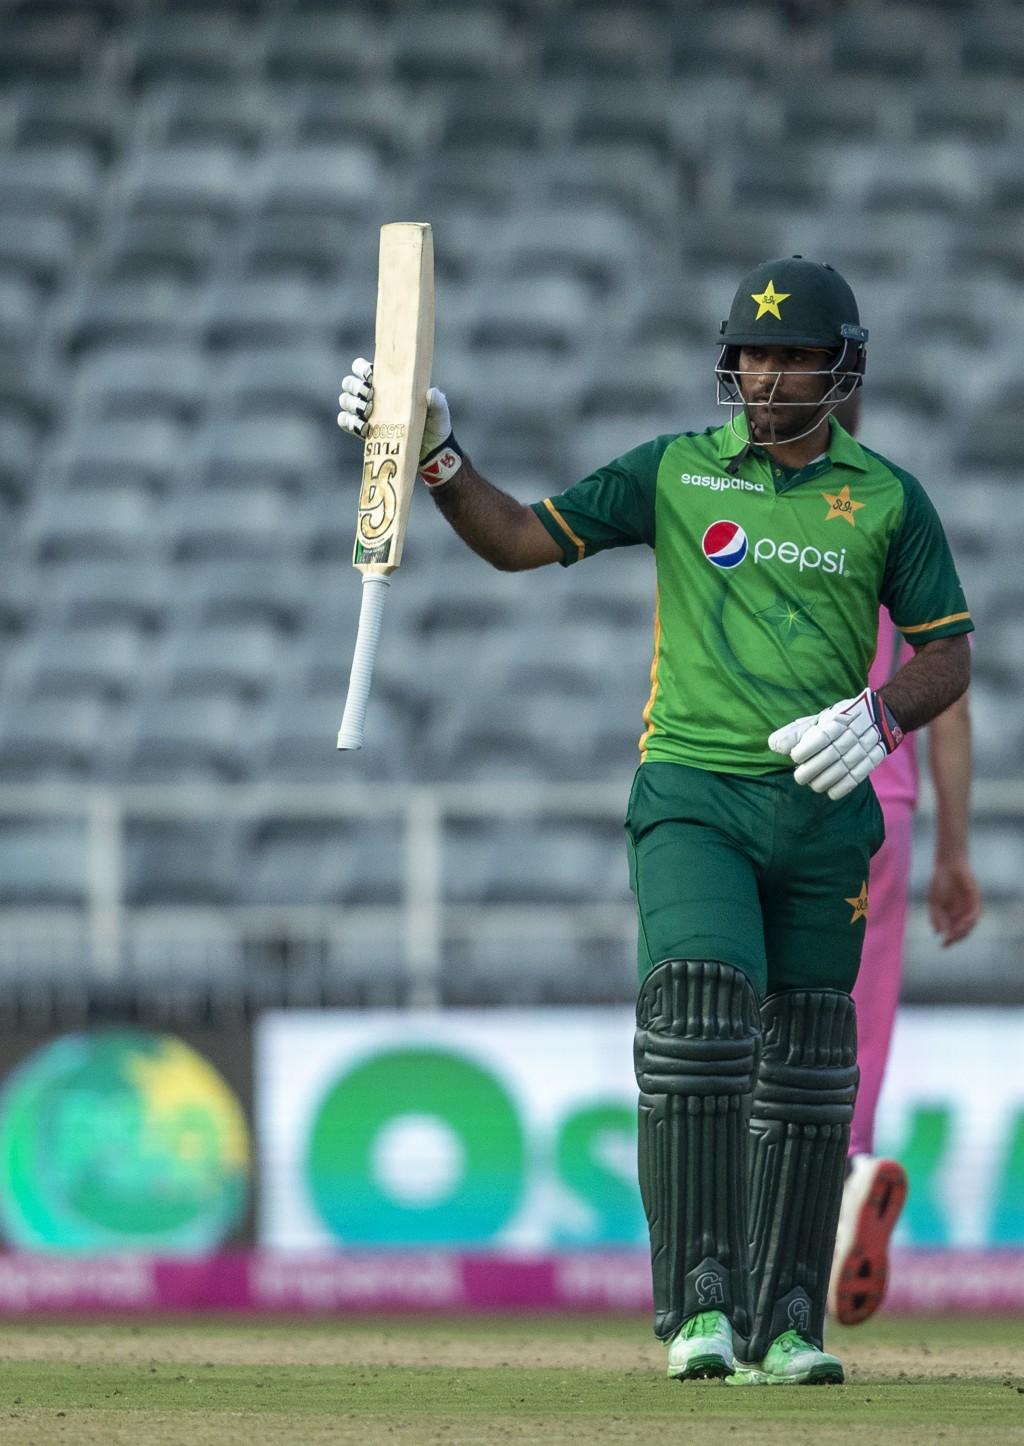 Pakistan's batsman Fakhar Zaman raises his bat to celebrate scoring a century during the second One Day International cricket match between South Afri...